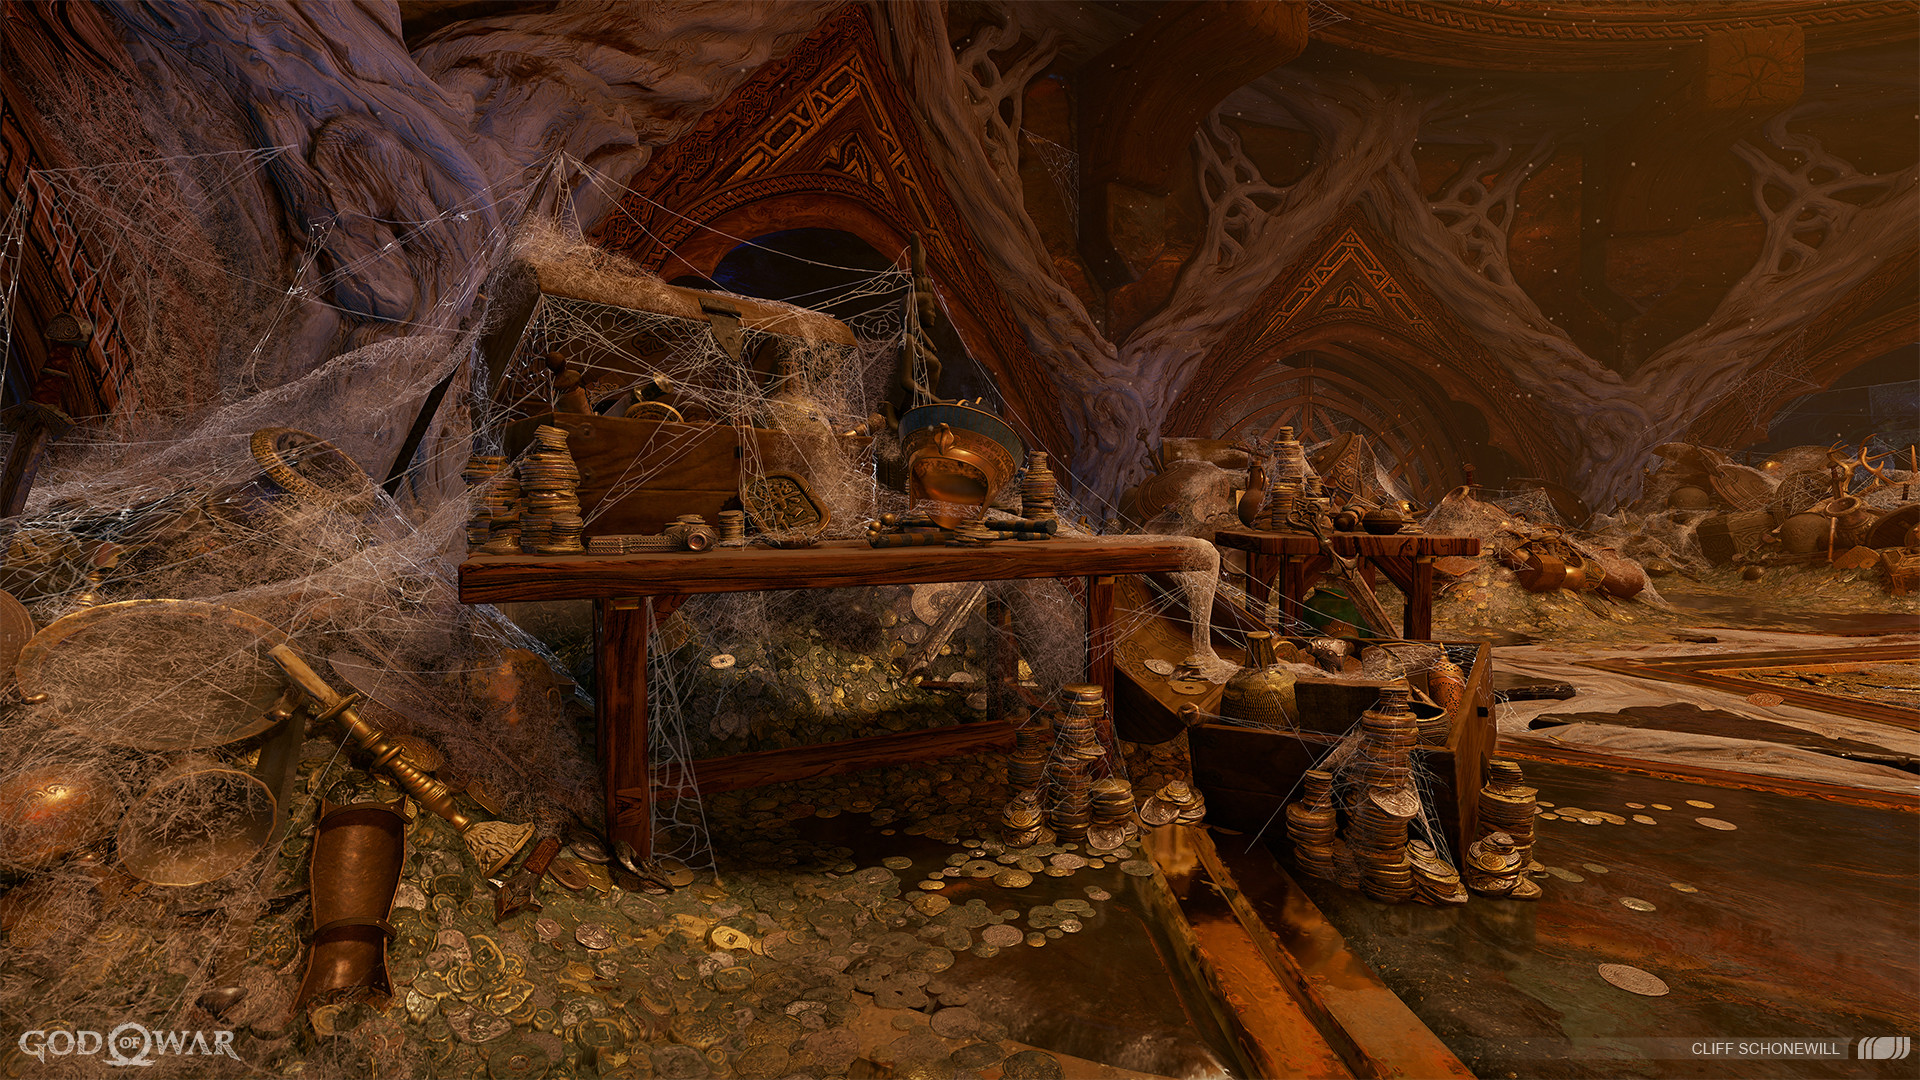 Cliff schonewill tyrsvault vaultrooms 15